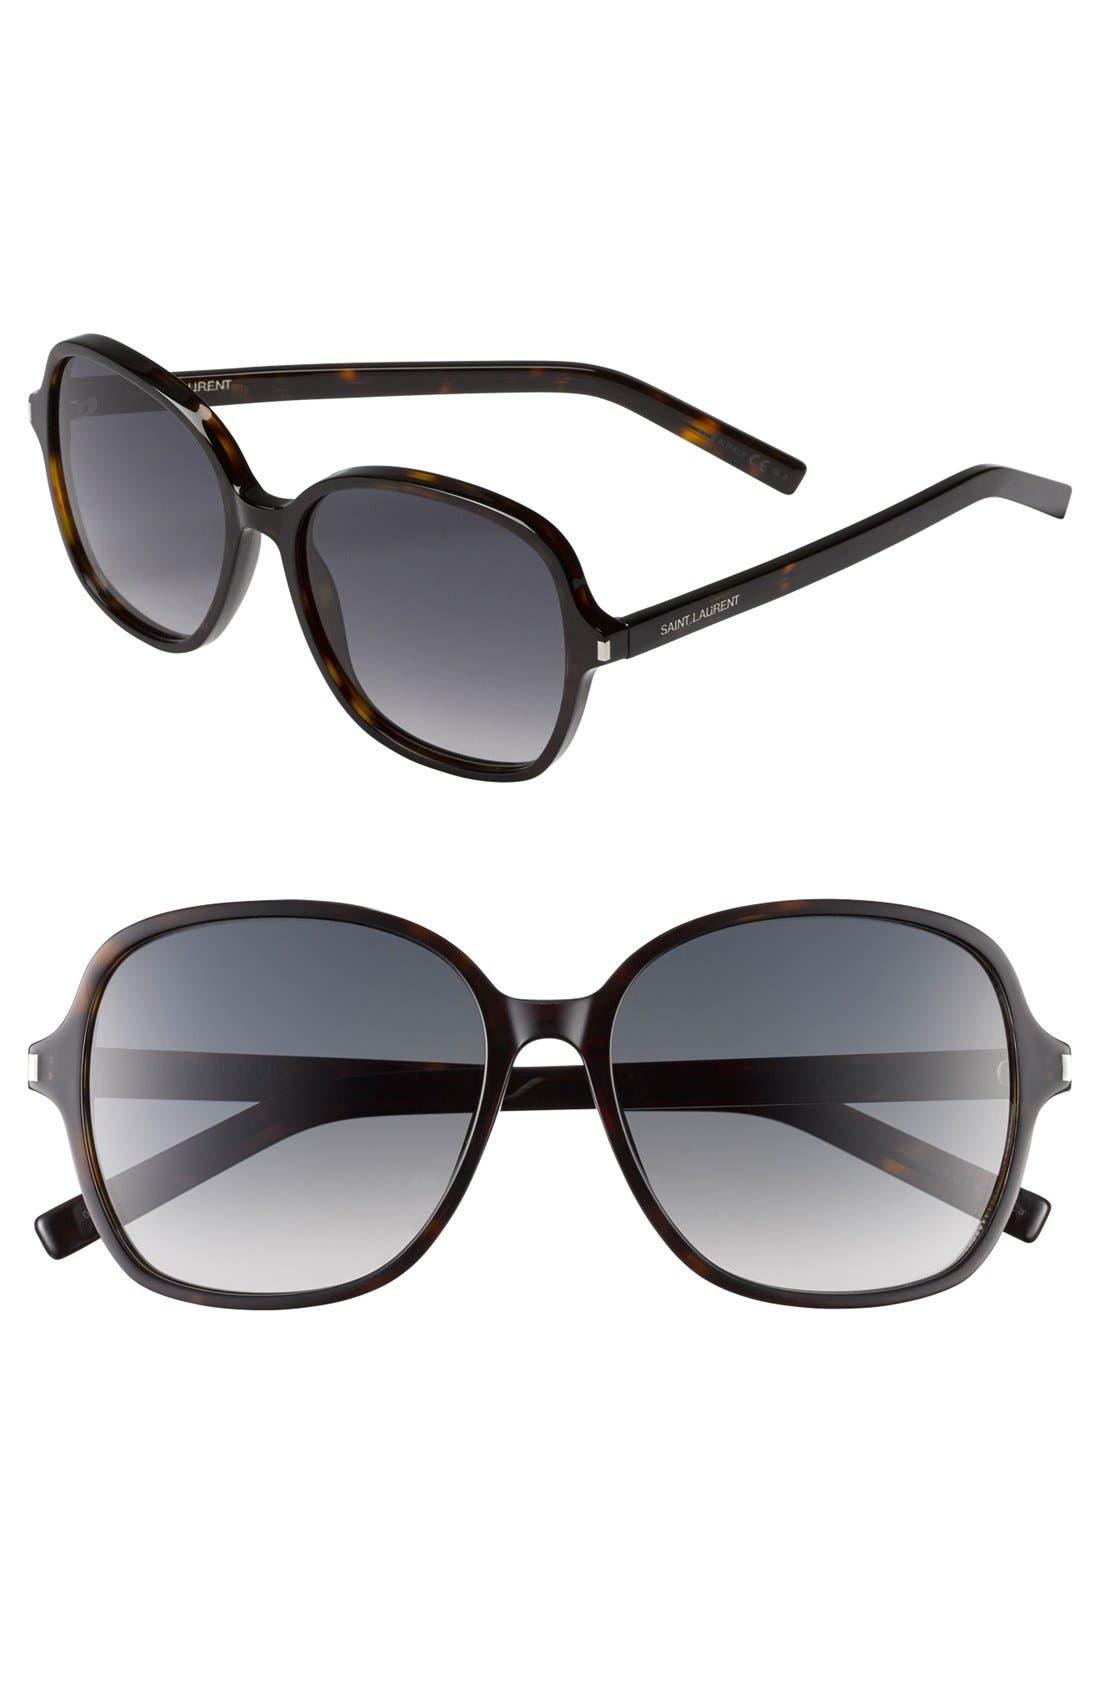 Main Image - Saint Laurent 57mm Oversize Sunglasses